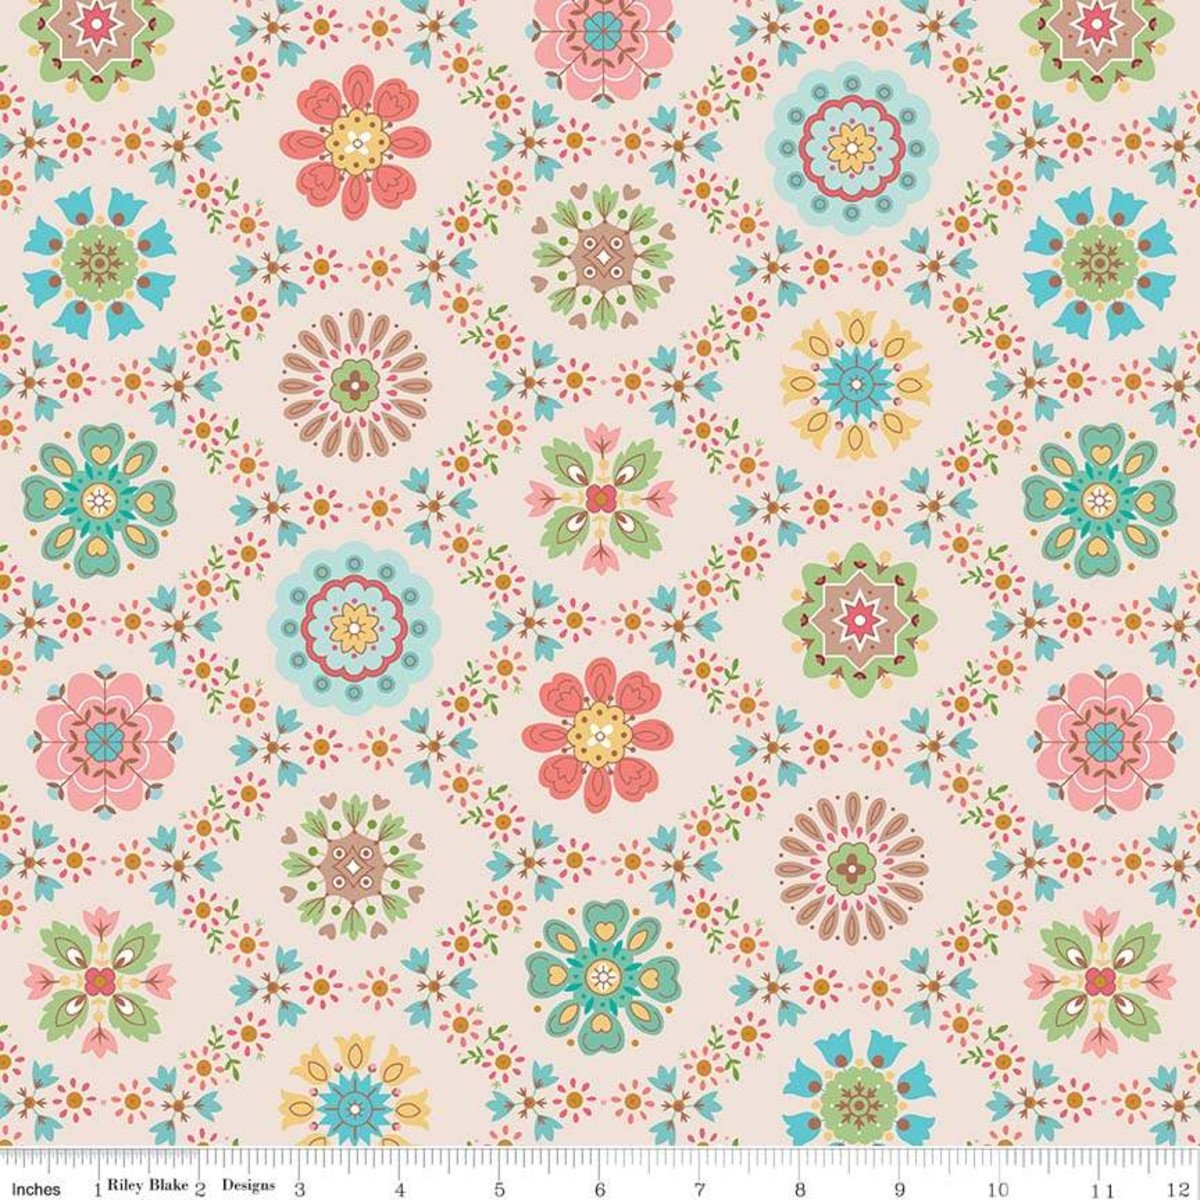 Fabric Granny Chic Applique Multi C8510-Multi